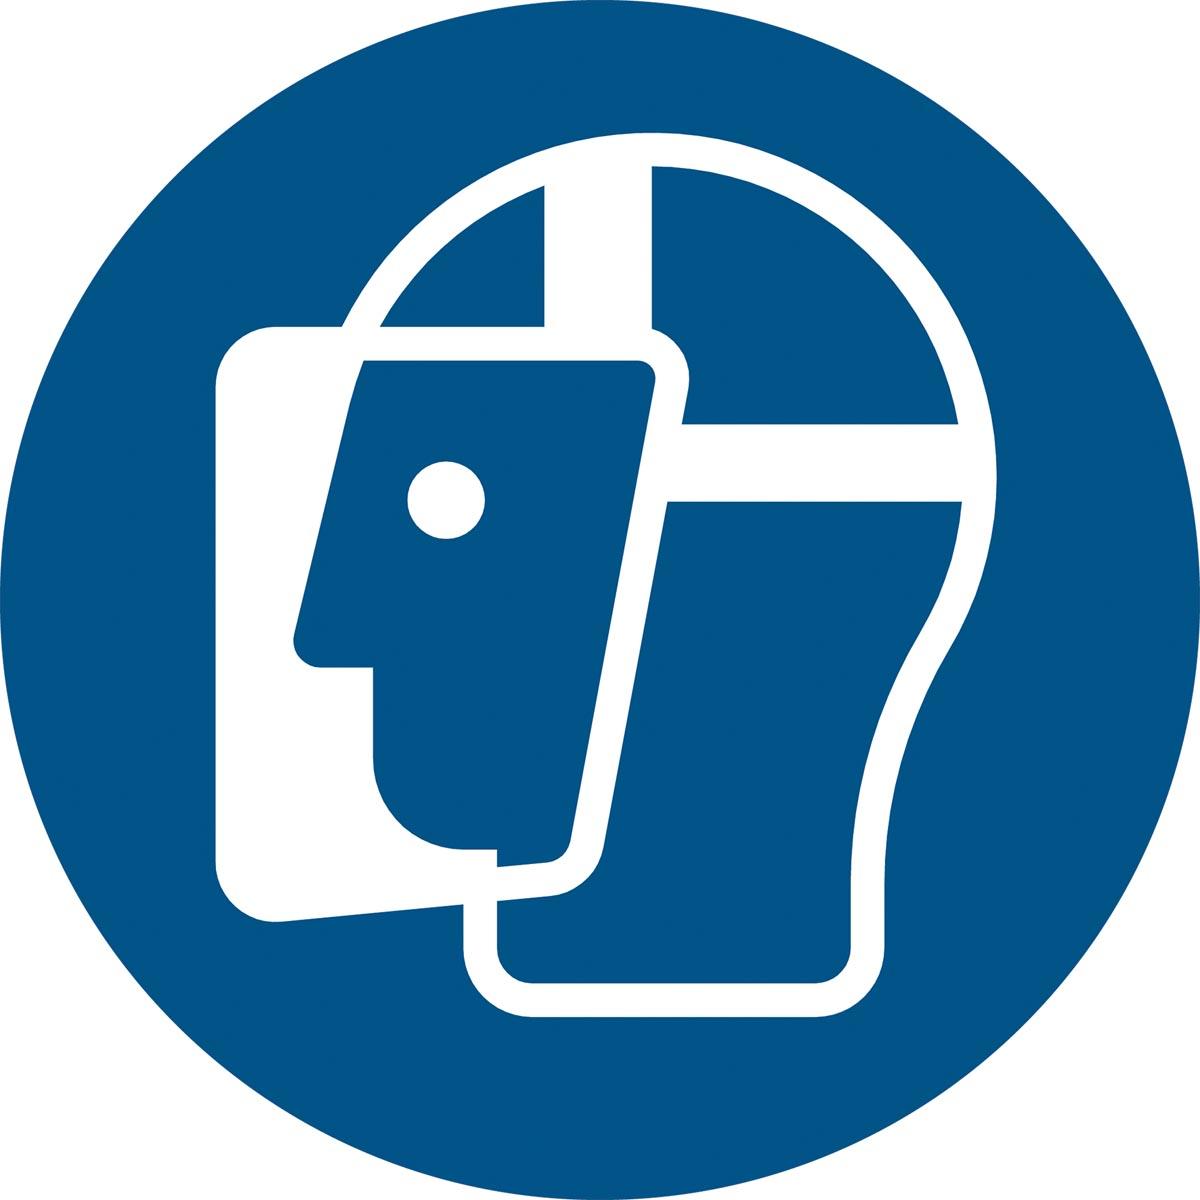 Tarifold gebodsbord uit PP, gezichtsbescherming verplicht, diameter 20 cm